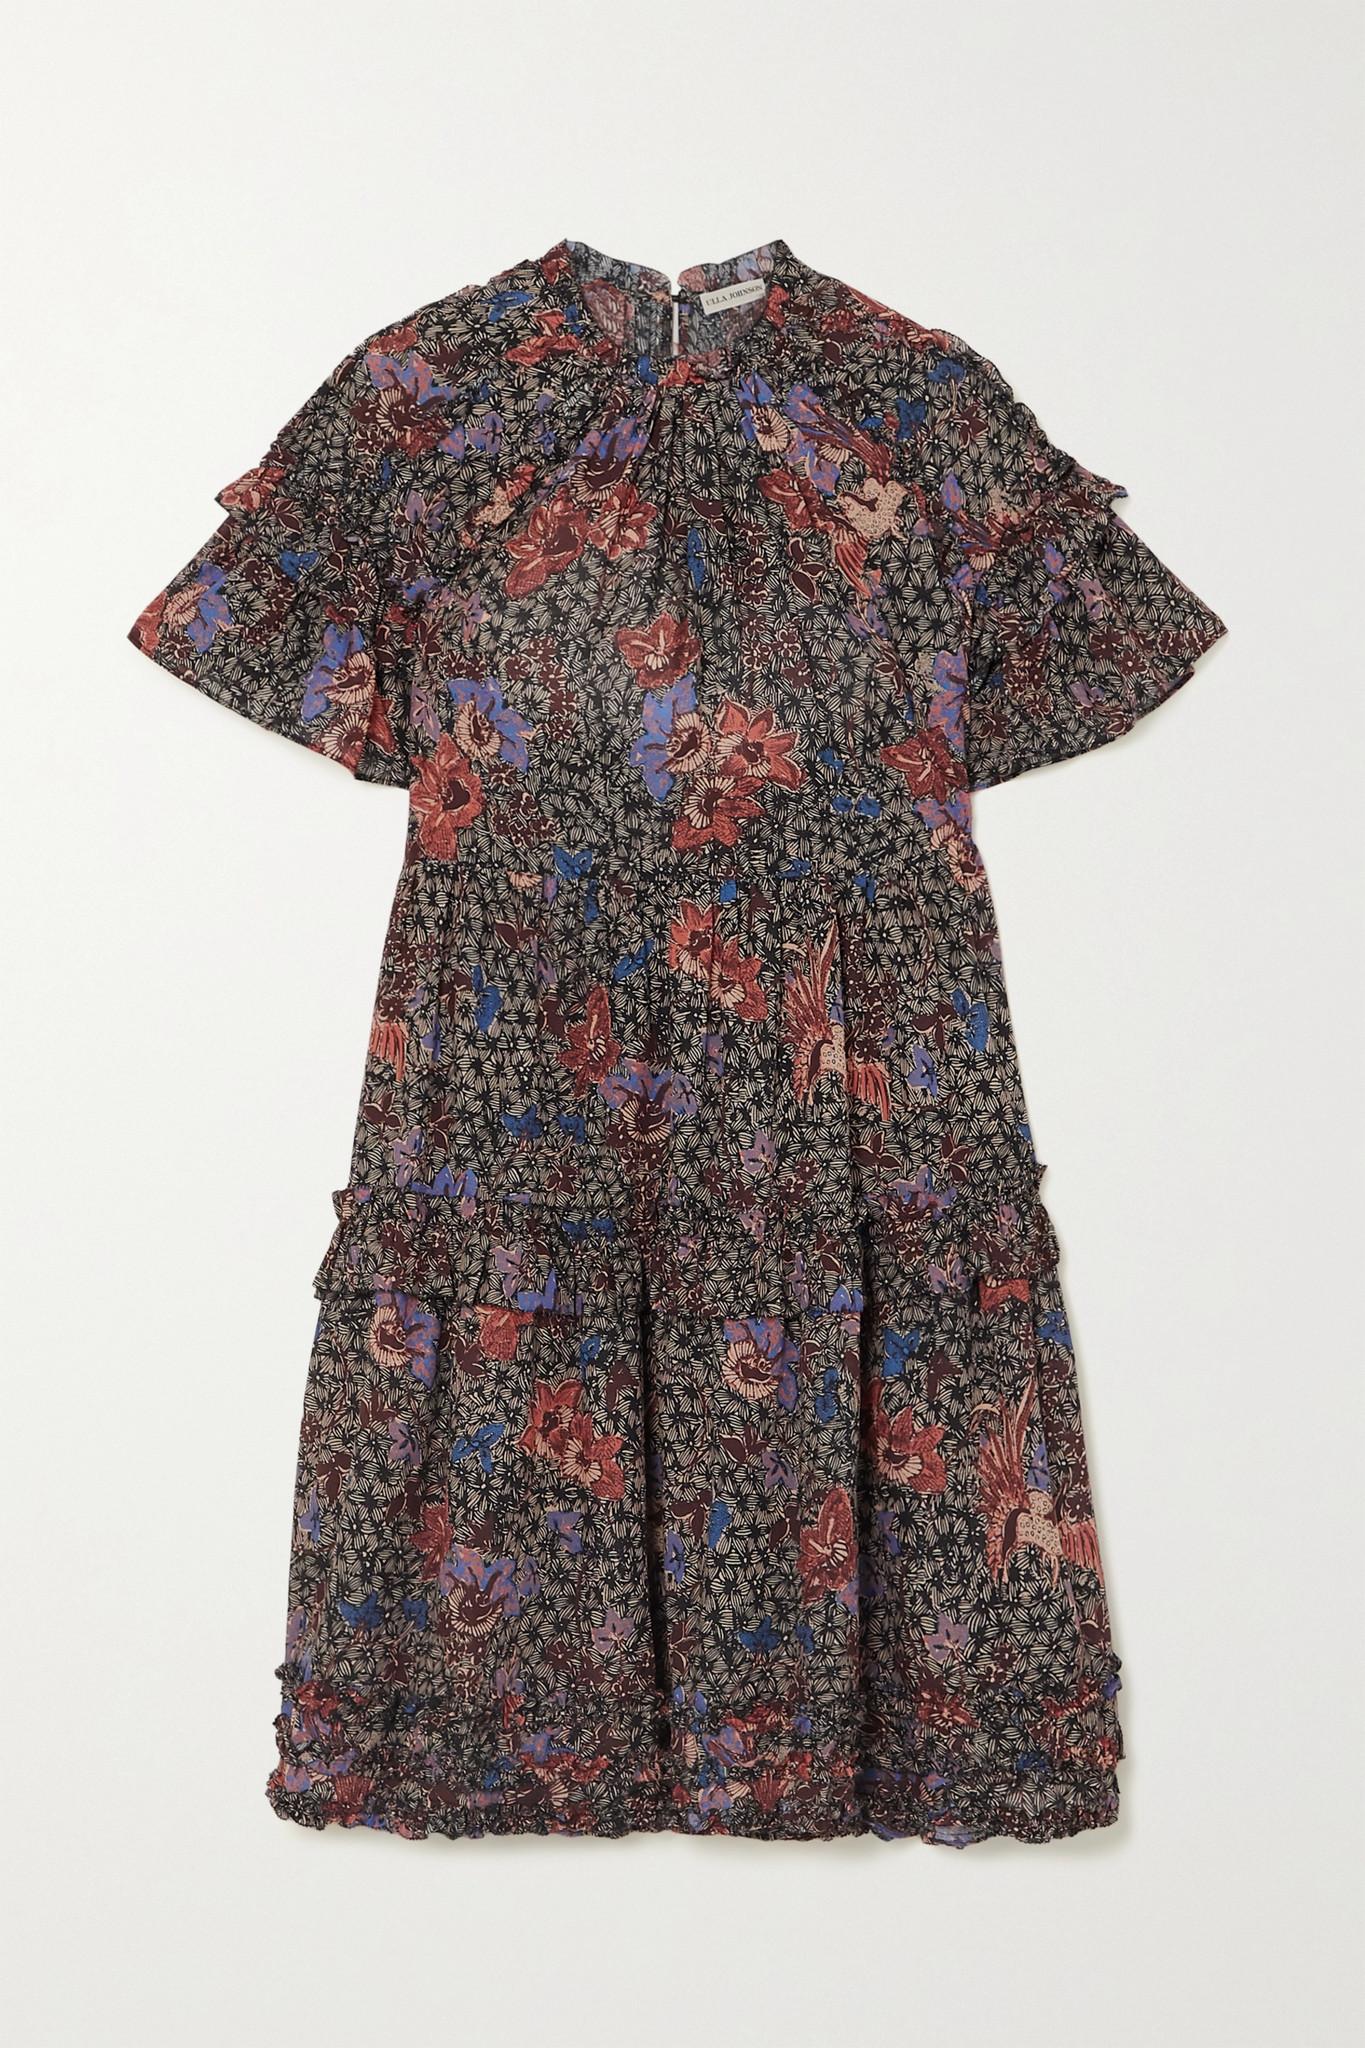 ULLA JOHNSON - Delia 褶饰花卉印花棉质混纺迷你连衣裙 - 蓝色 - US2